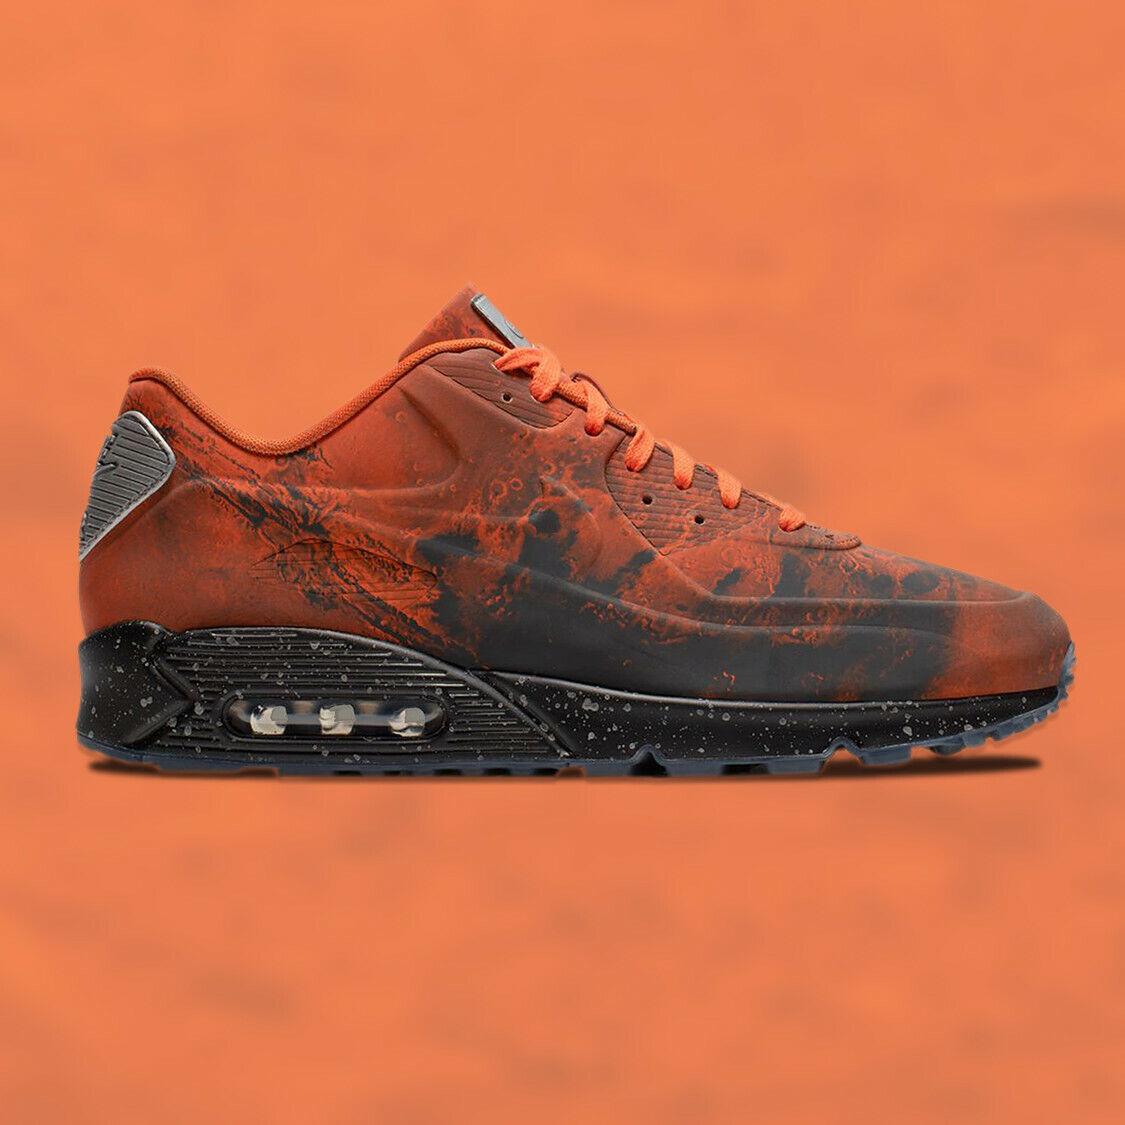 Nike Air Max 90,  MARS LANDING  - UK10